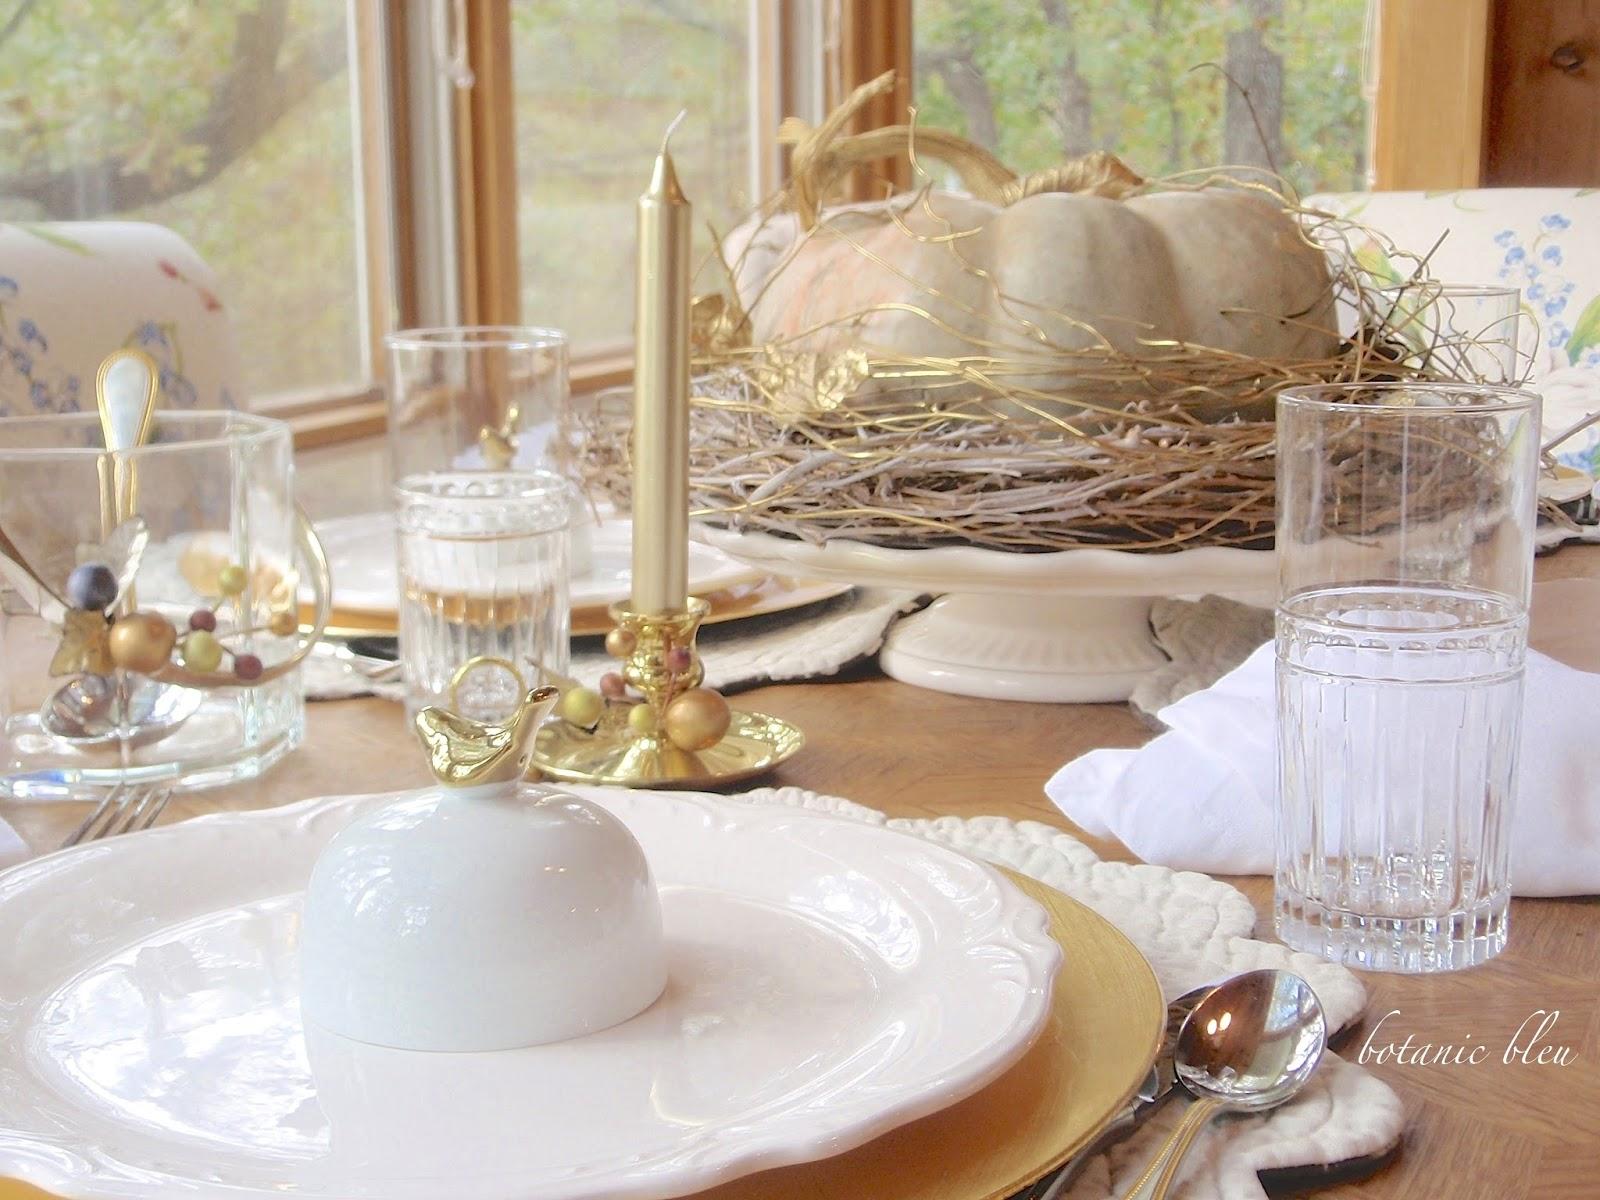 Botanic Bleu: Thanksgiving Gold and White Table